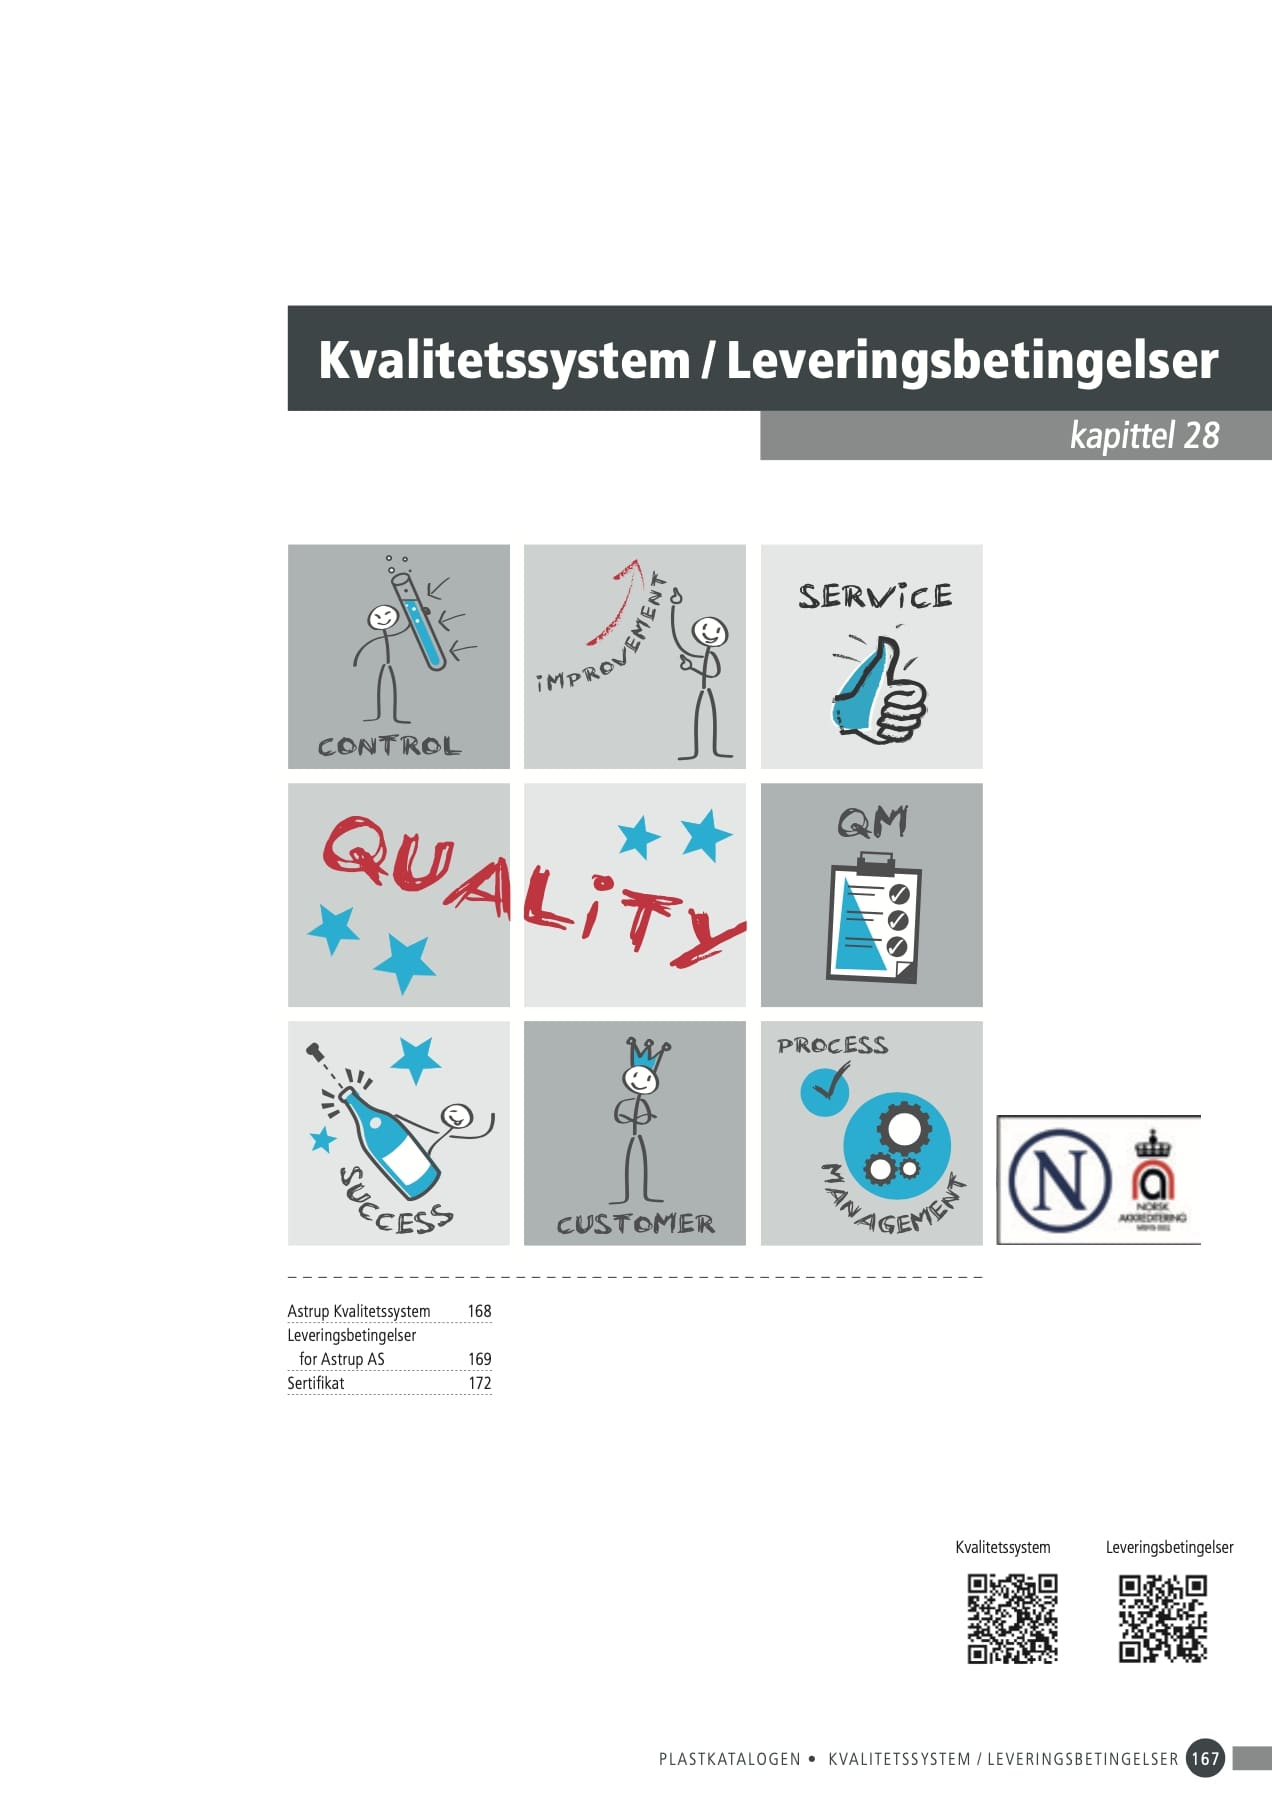 28. Kvalitetssystem